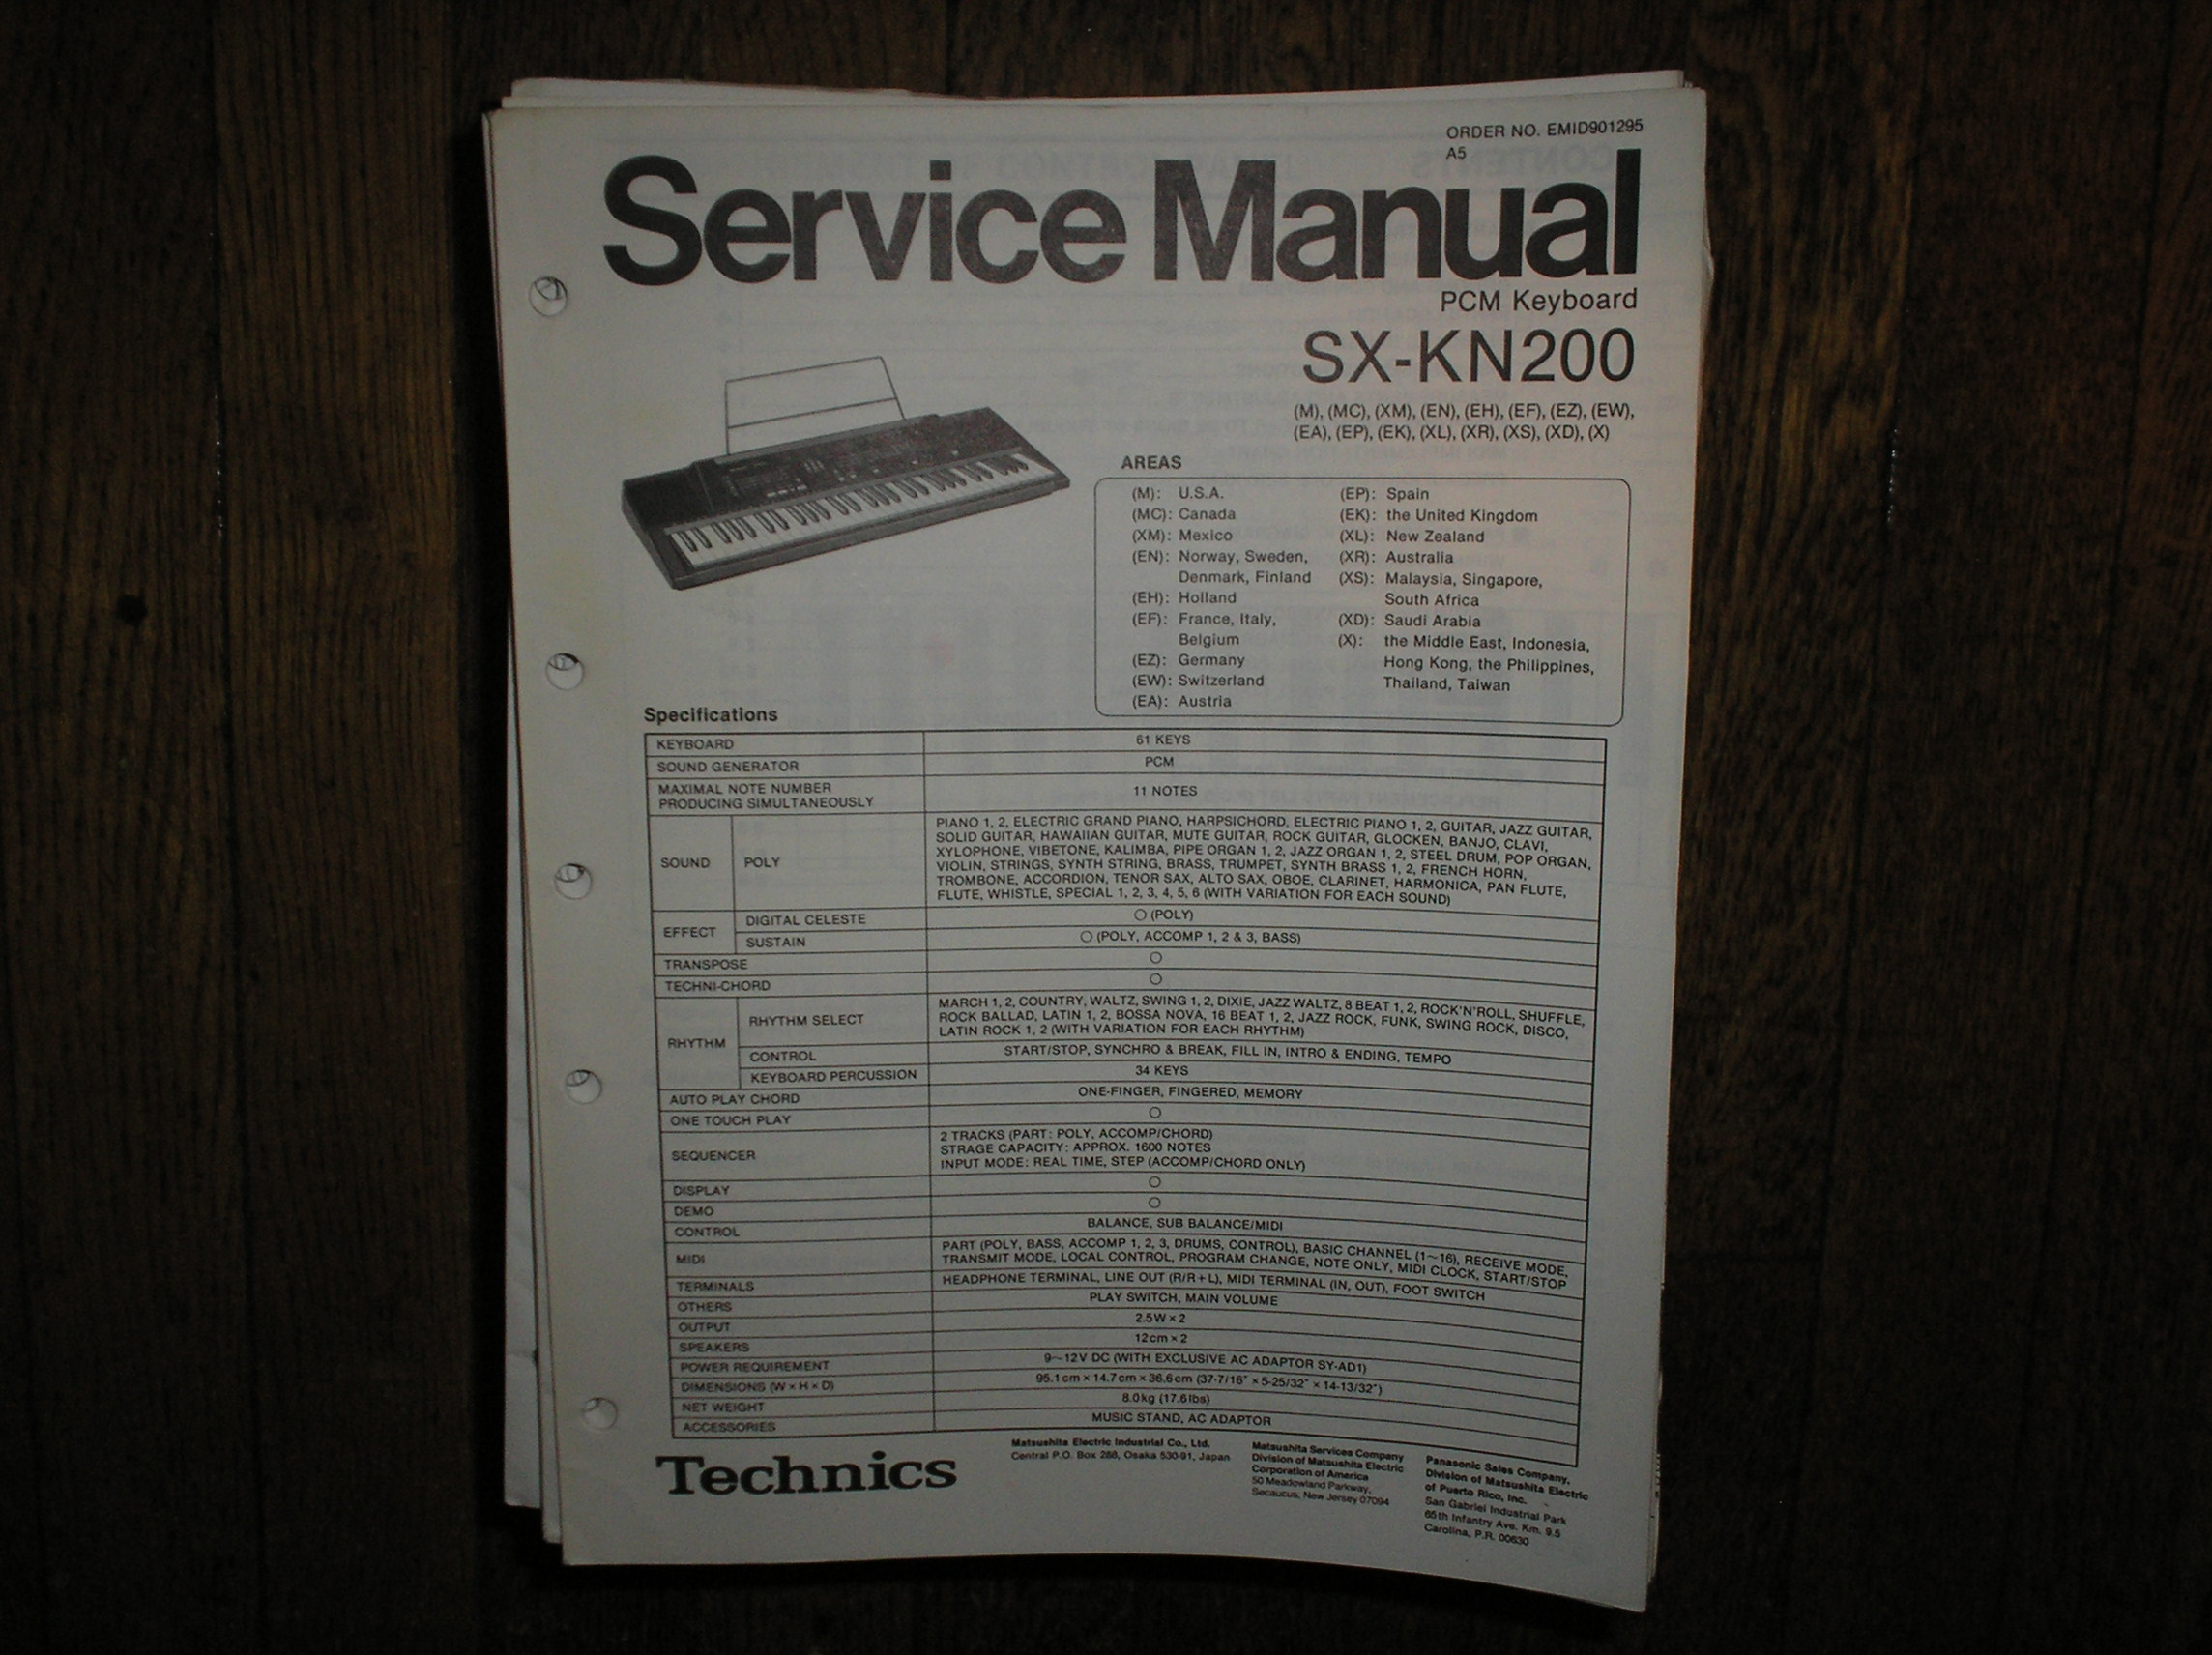 SX-KN200 PCM Keyboard Service Manual